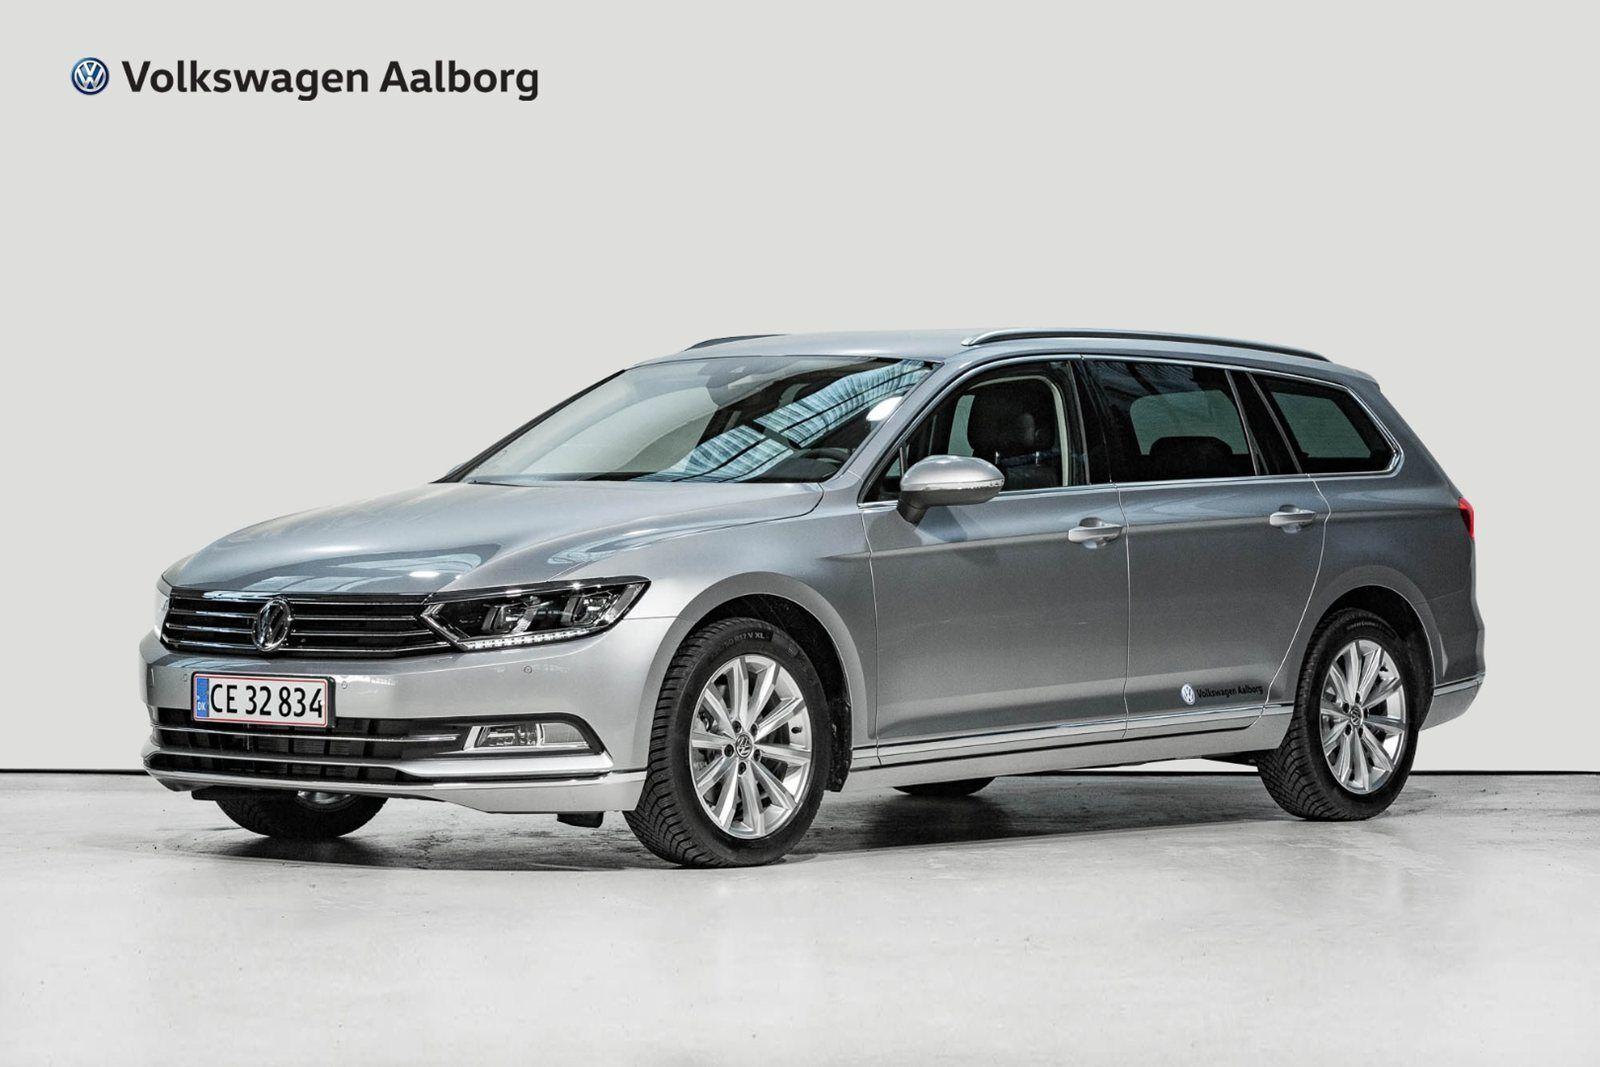 VW Passat 1,5 TSi 150 Highl. Prem. Vari. DSG 5d - 389.000 kr.